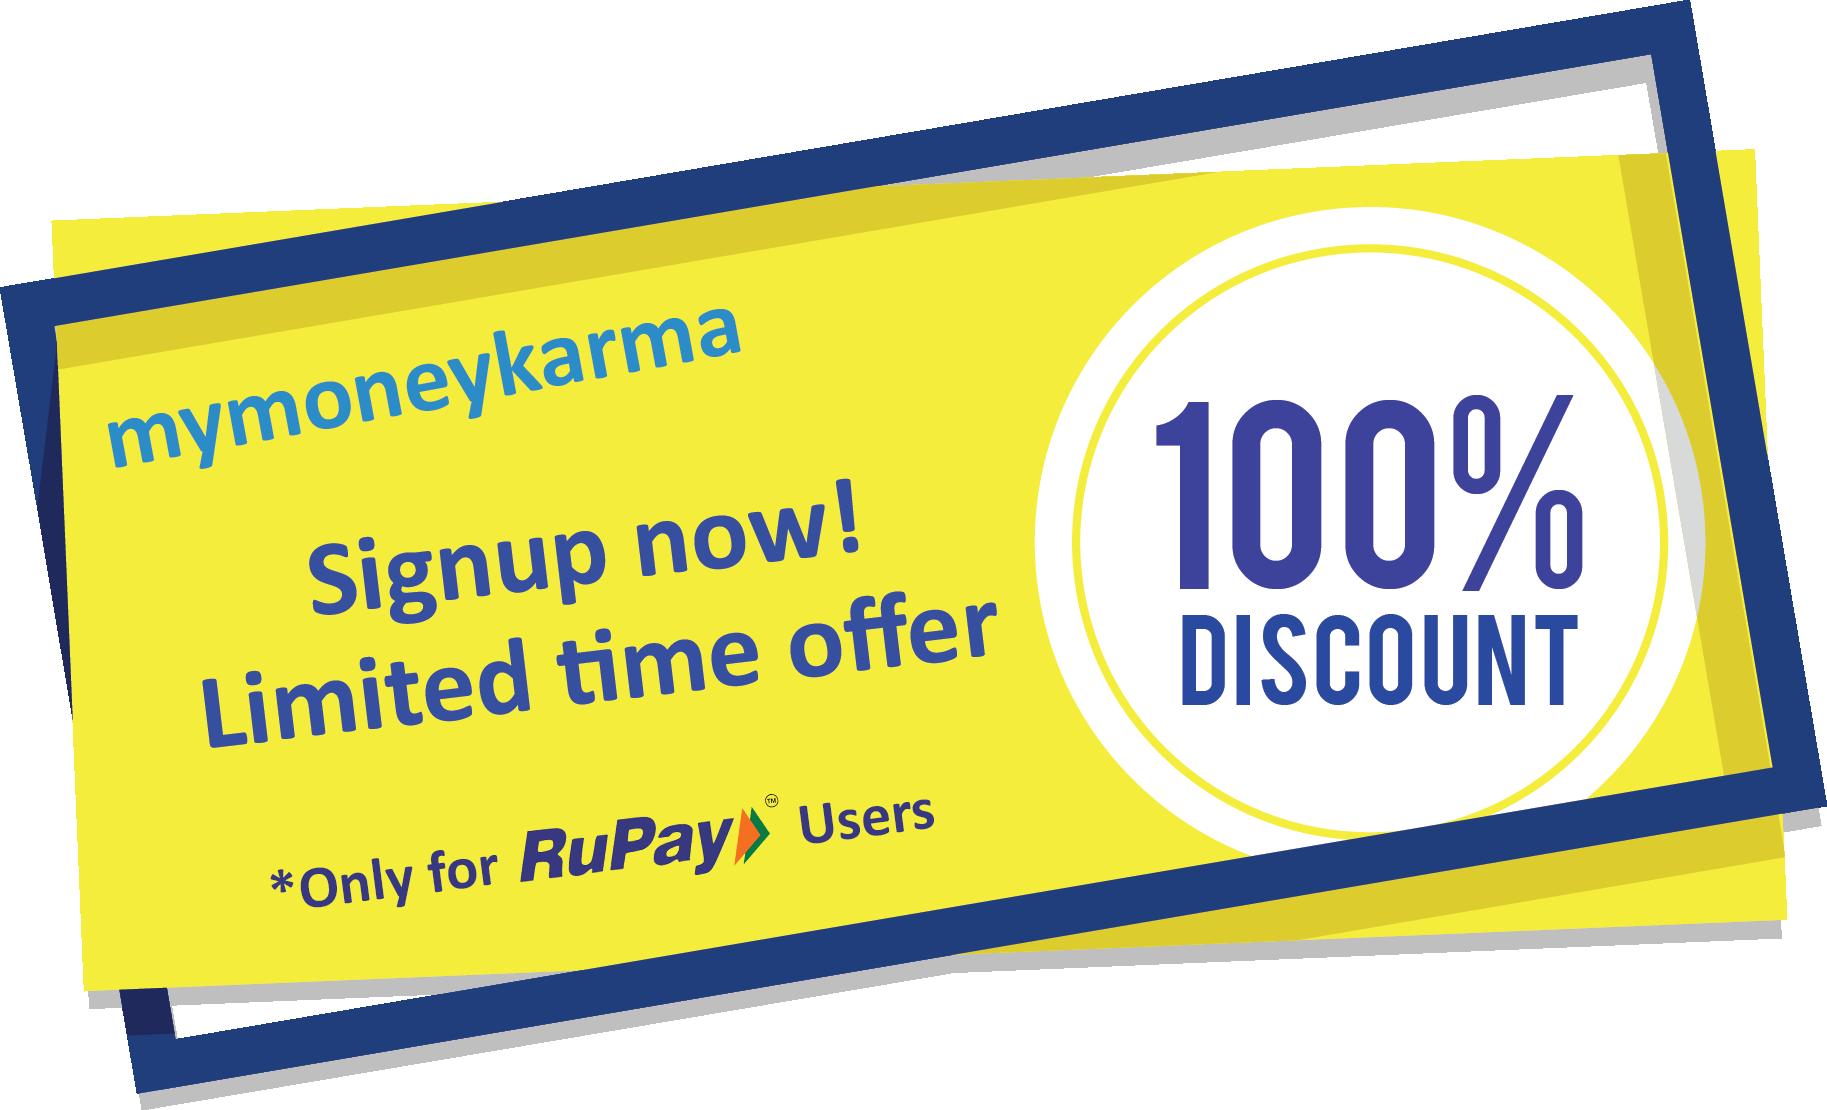 Rupay | Mymoneykarma